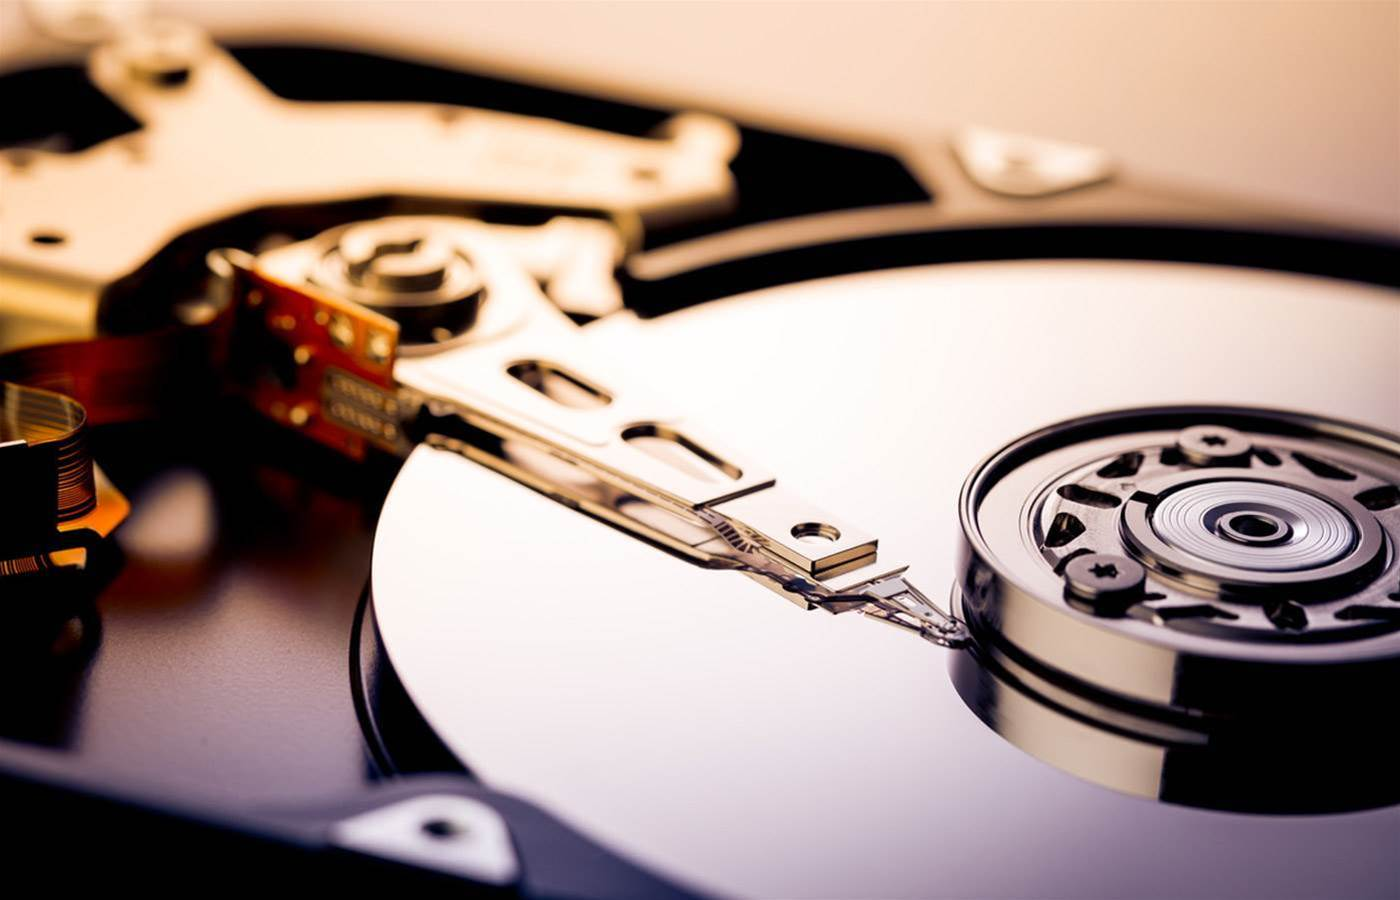 Seagate plans double-actuator disk drives